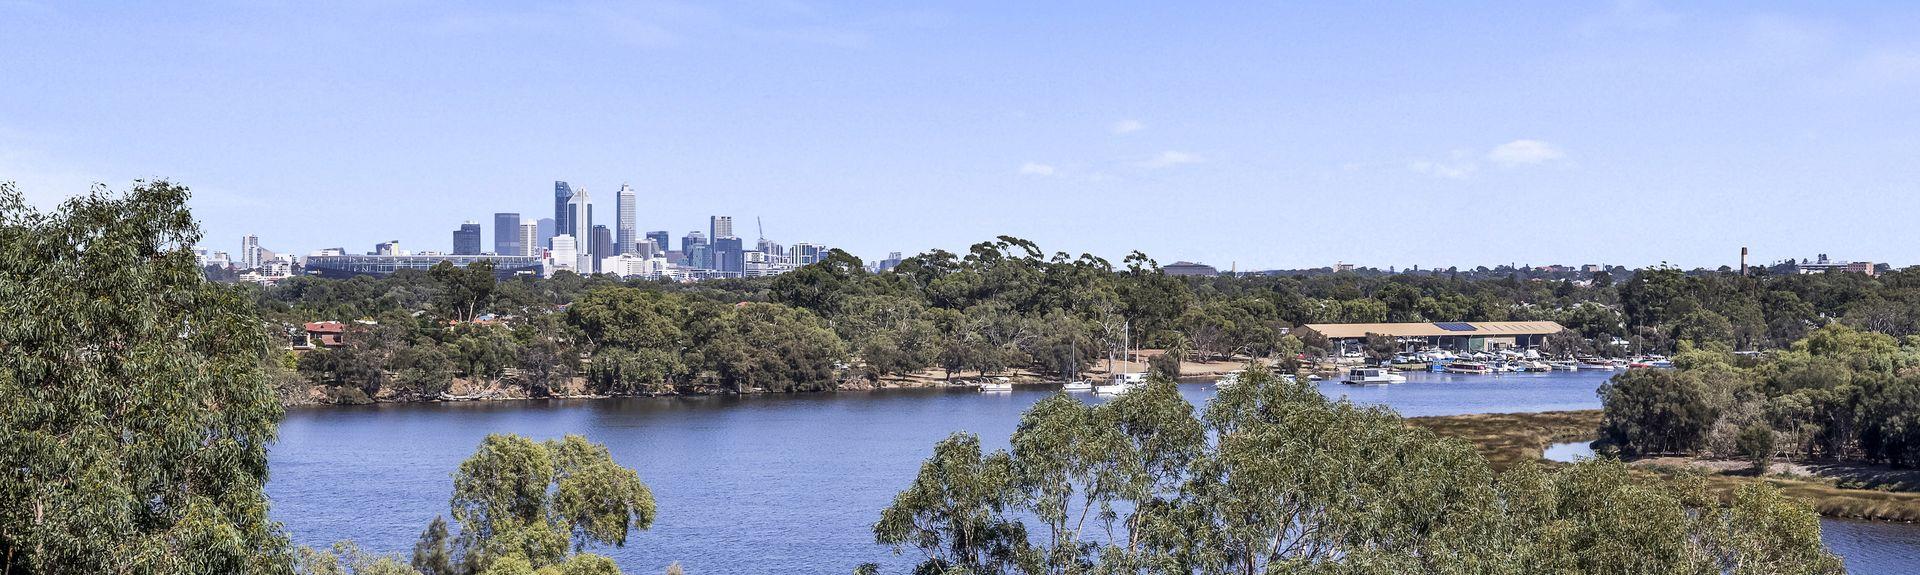 Hovea, Australie-Occidentale, Australie